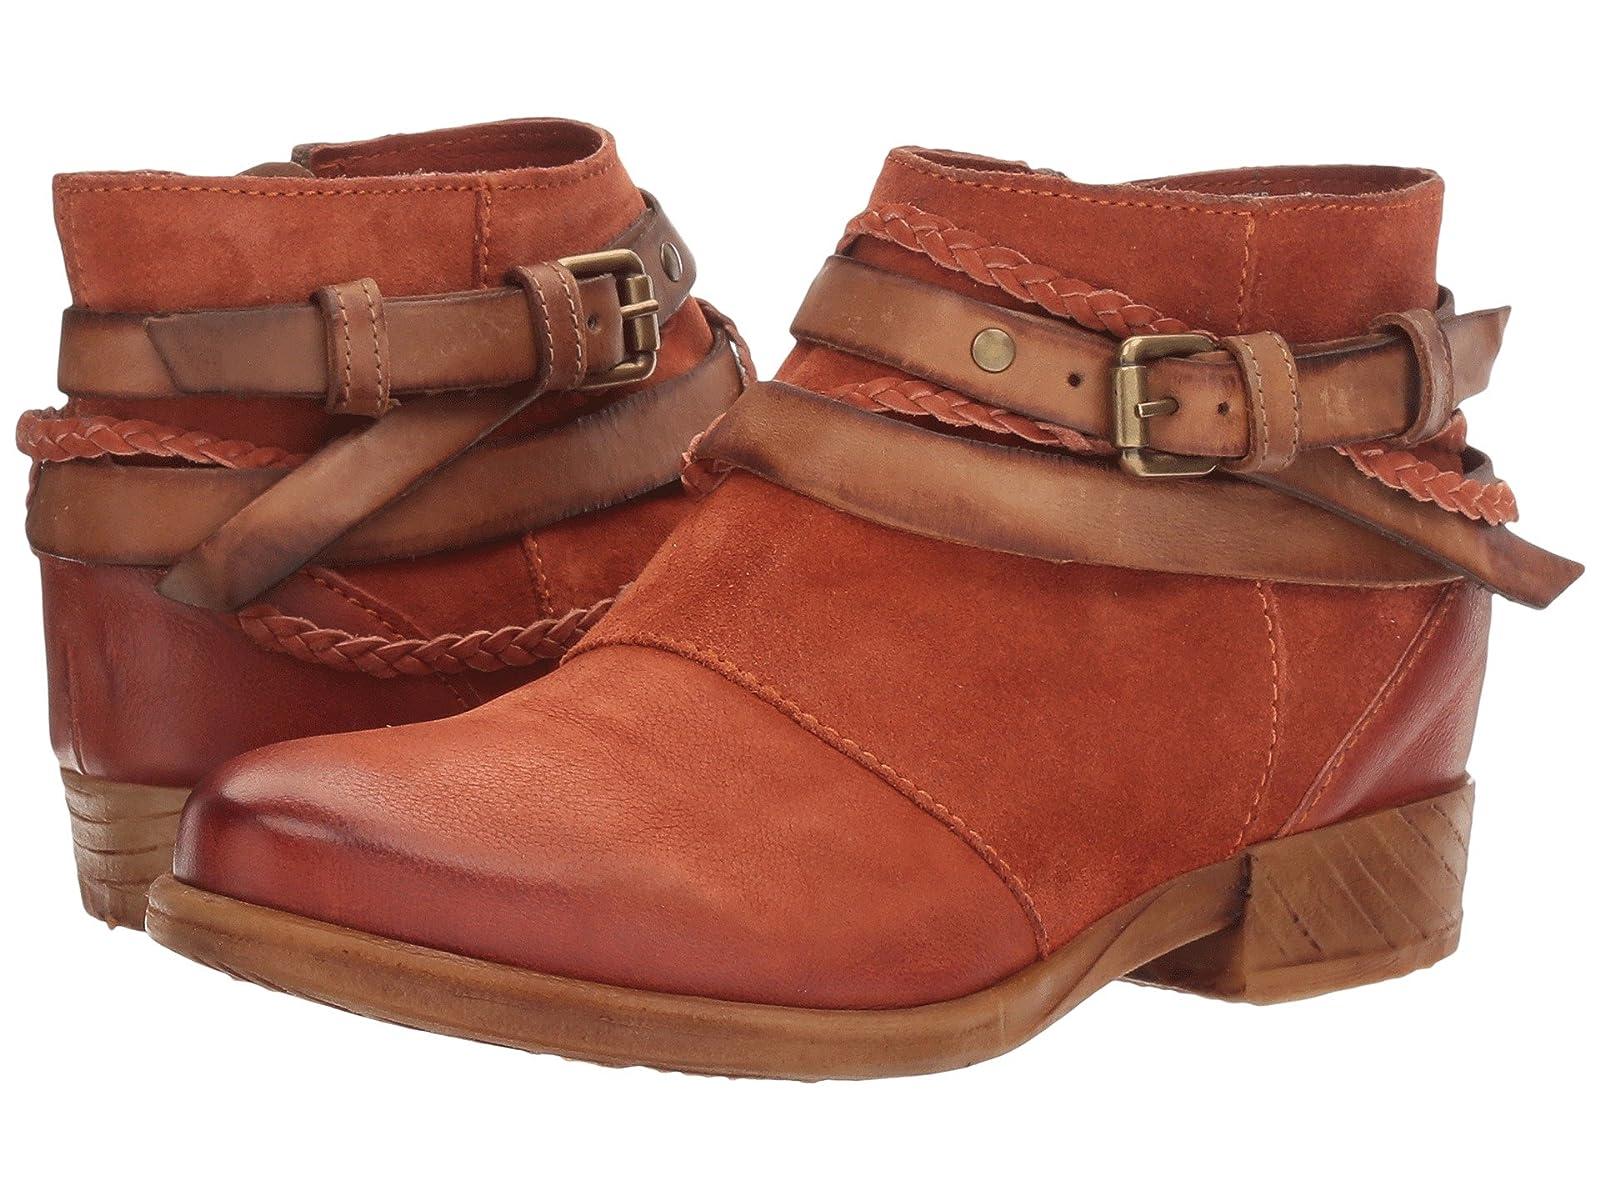 Miz Mooz DanitaCheap and distinctive eye-catching shoes